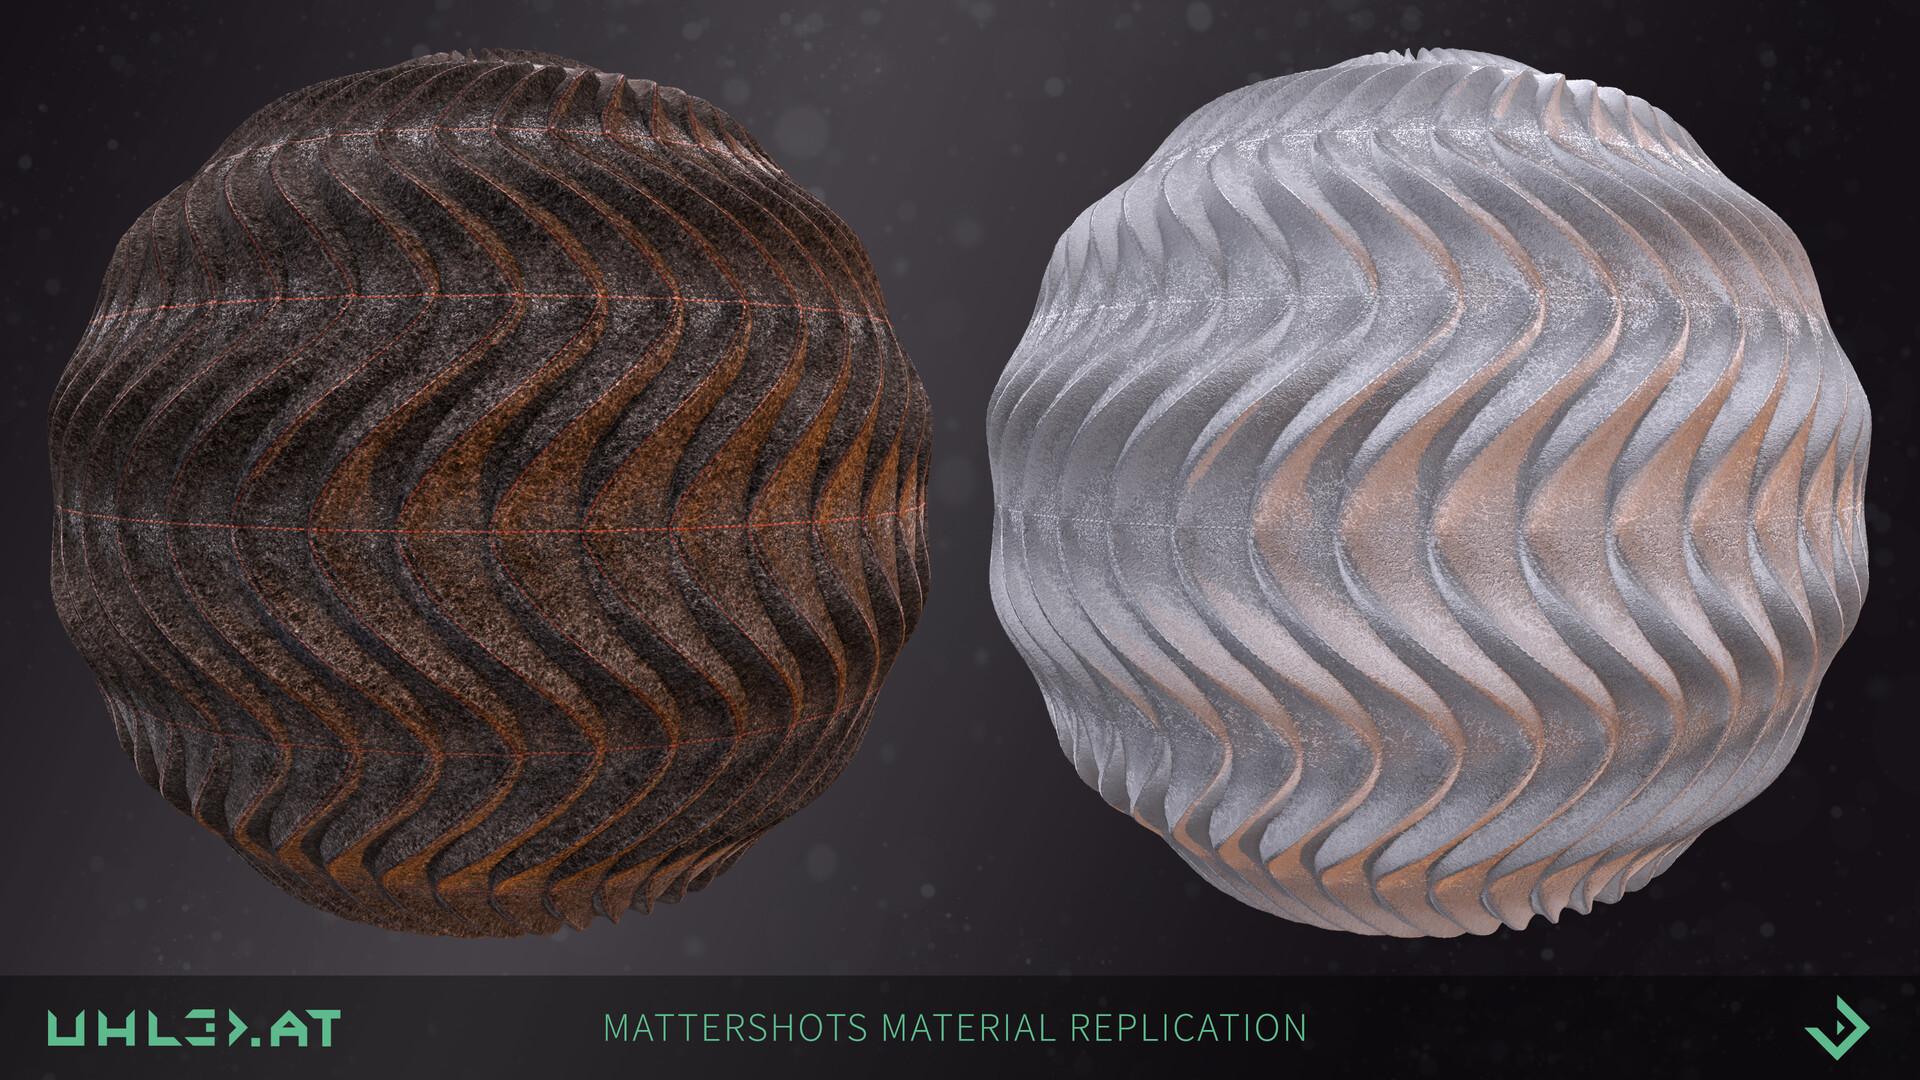 Dominik uhl mattershots replication 01